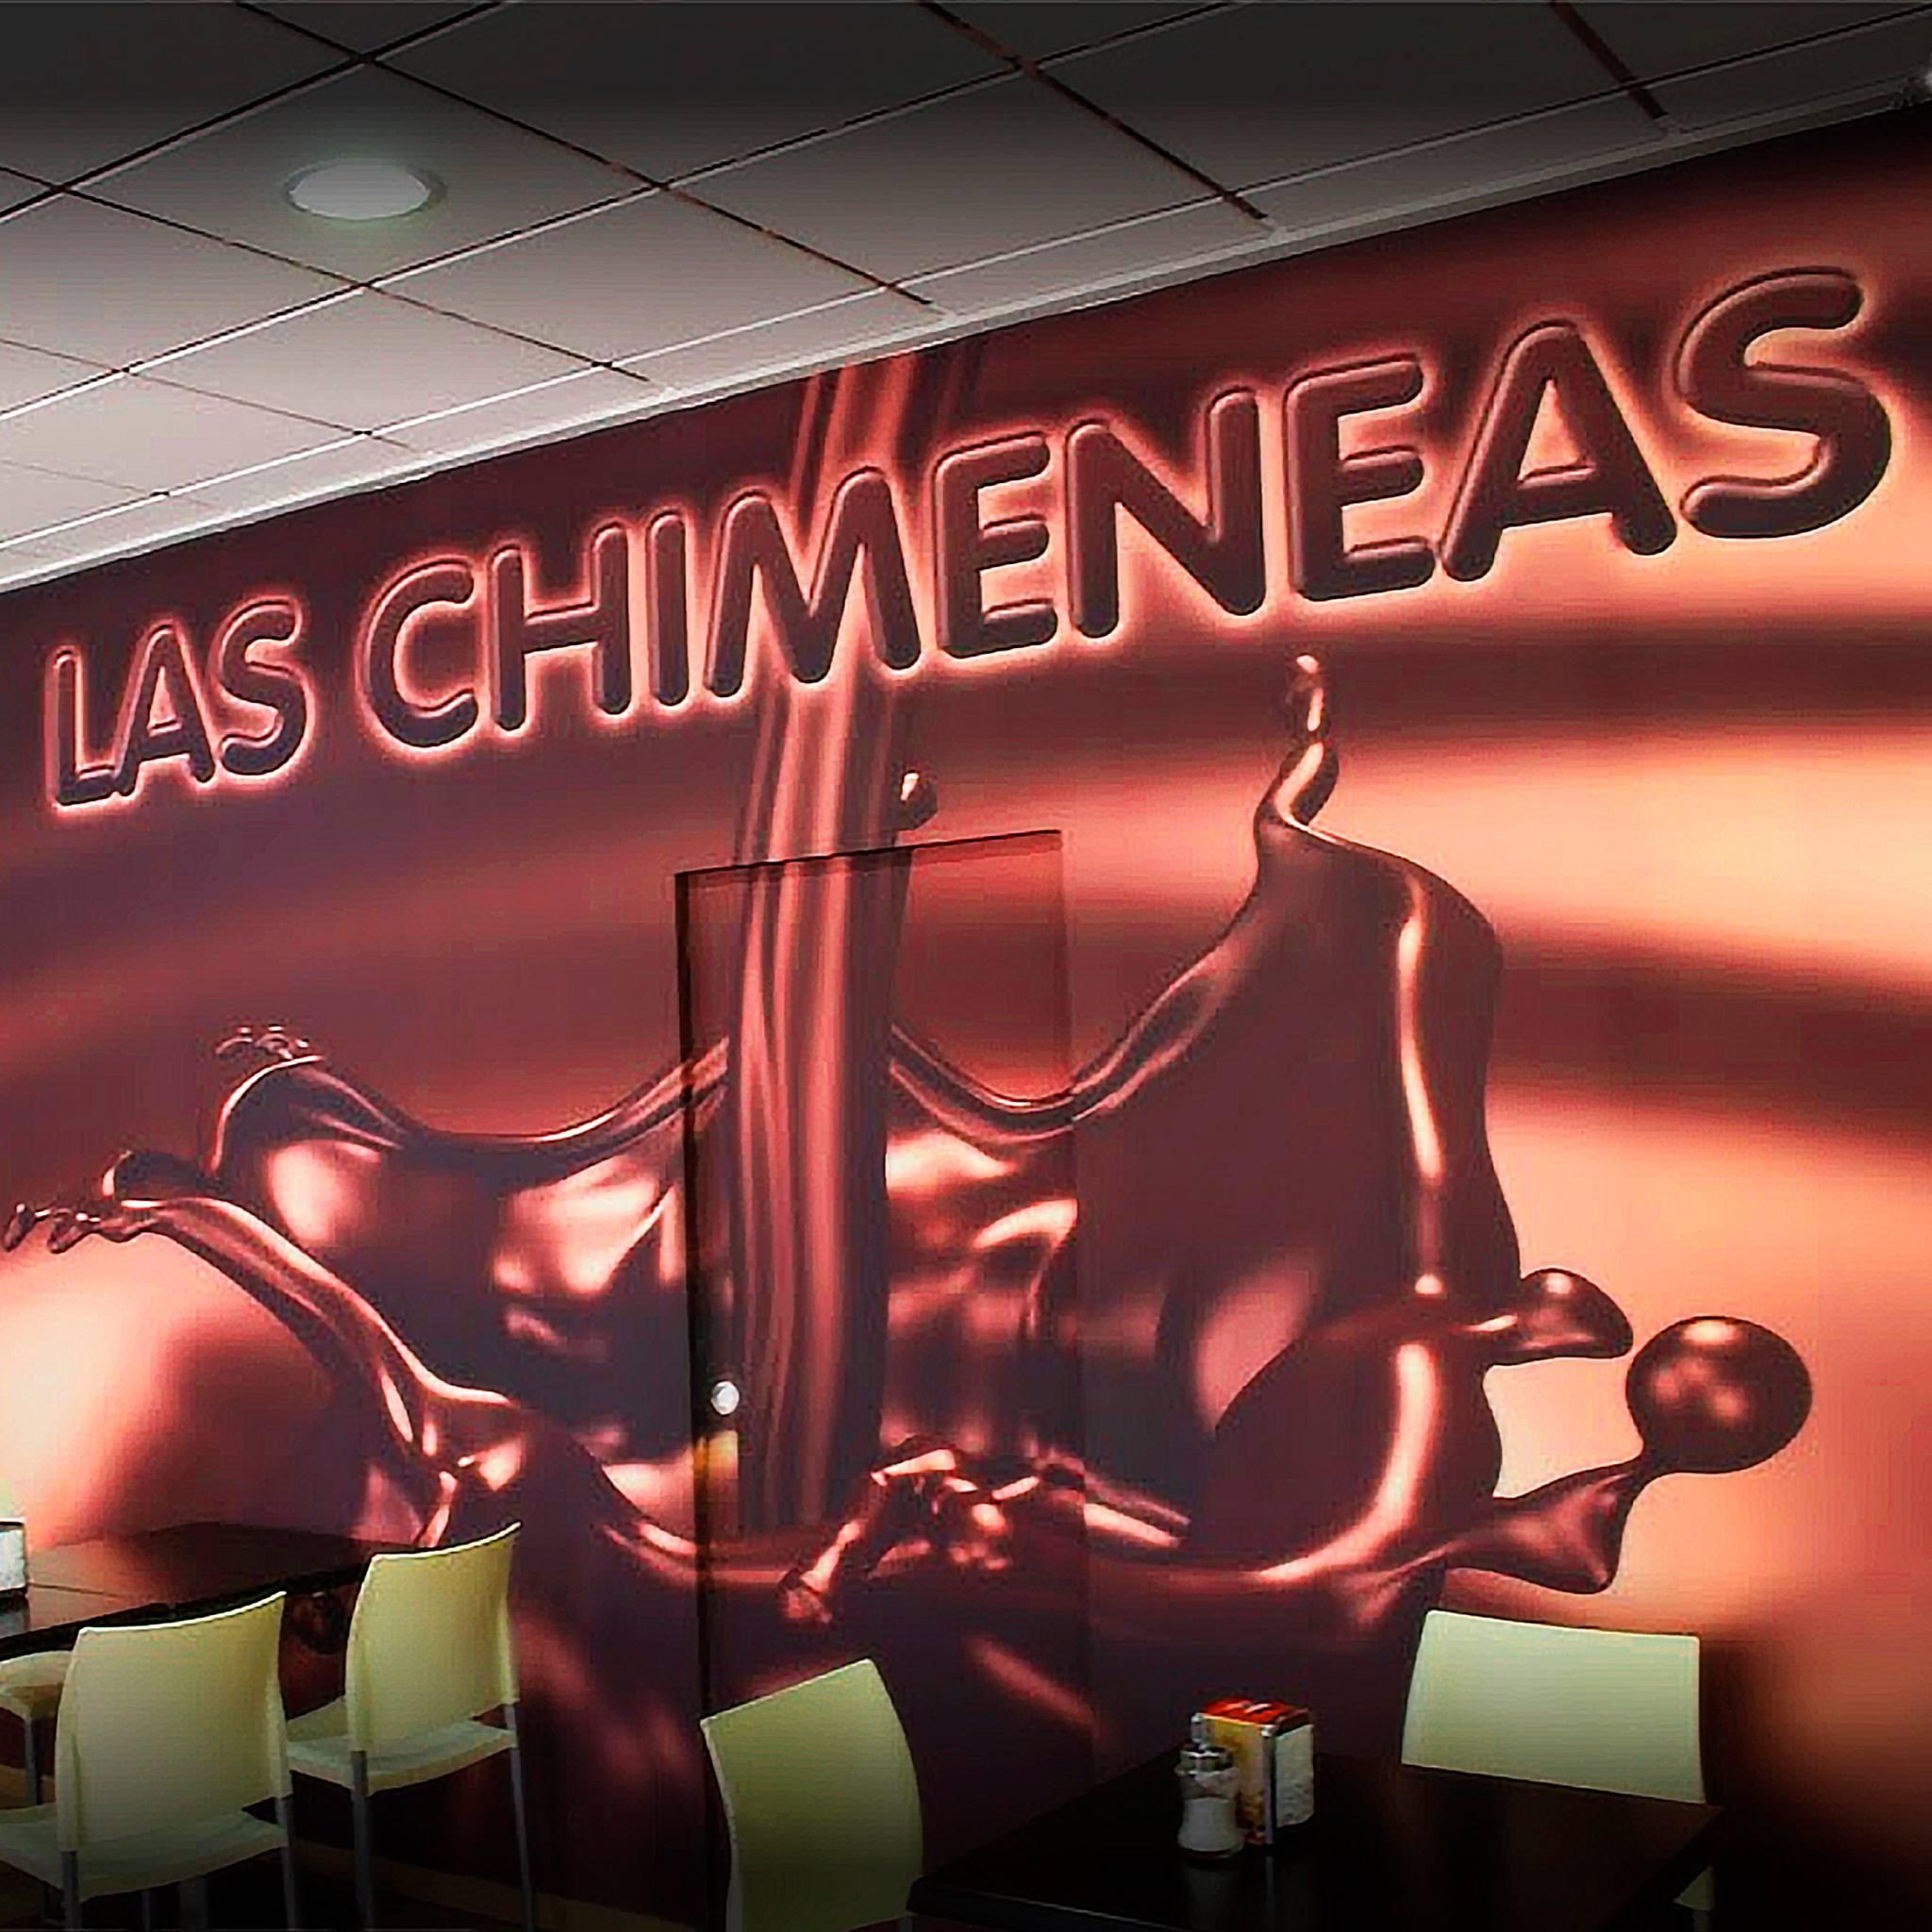 Churrería Las Chimeneas